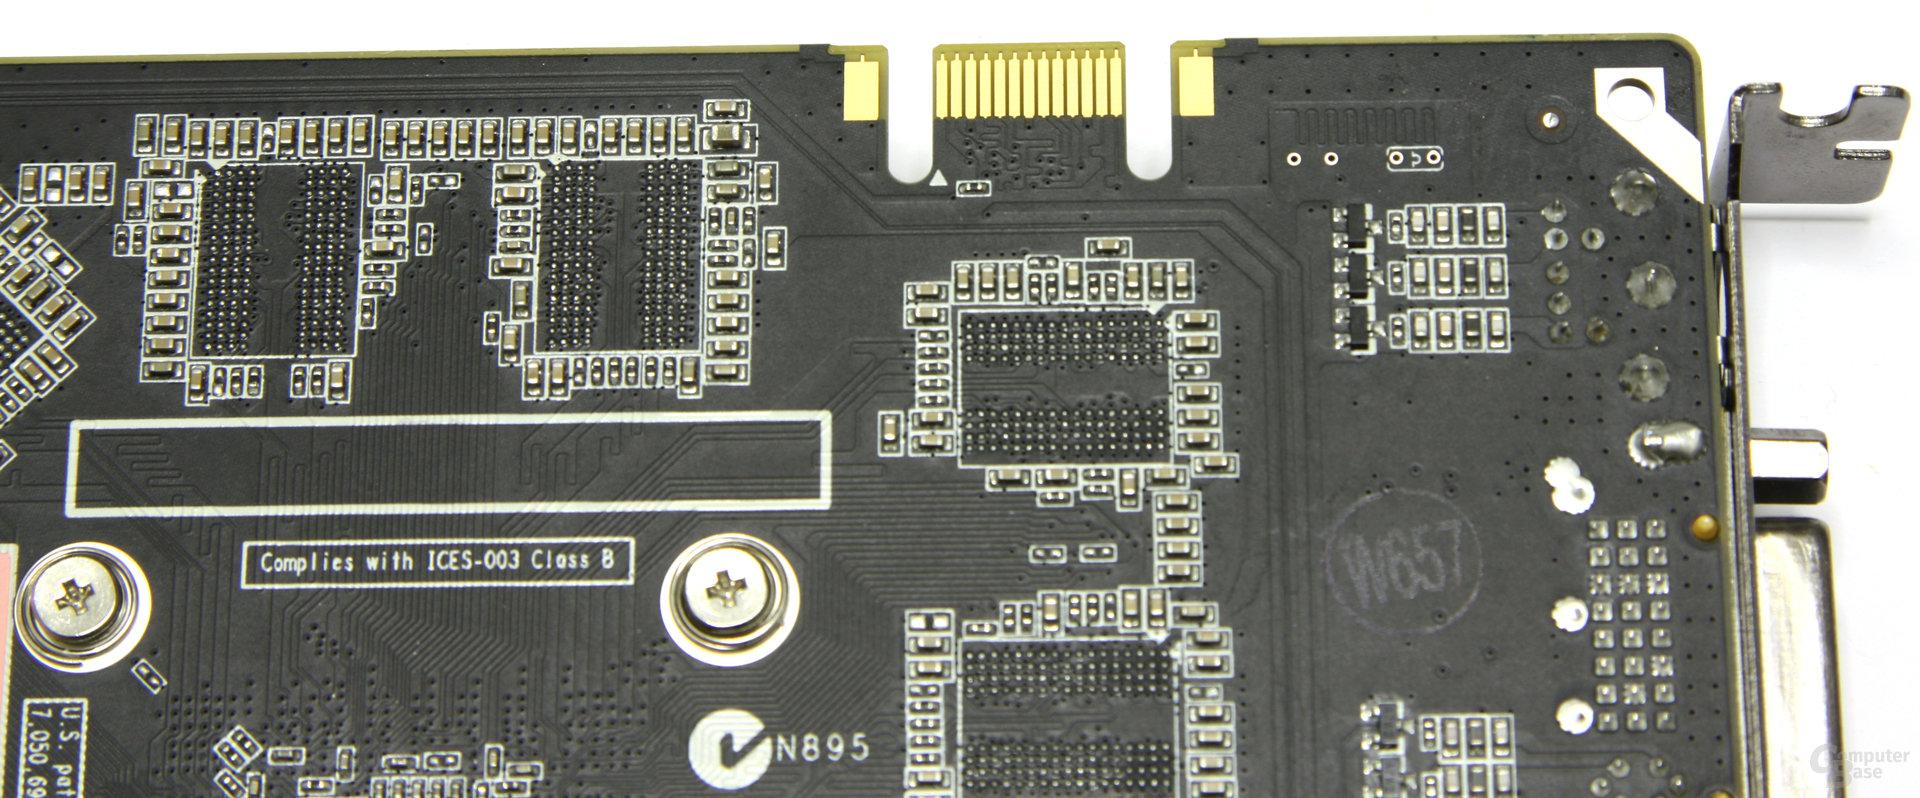 GeForce 9800 GT Eco SLI-Anschluss